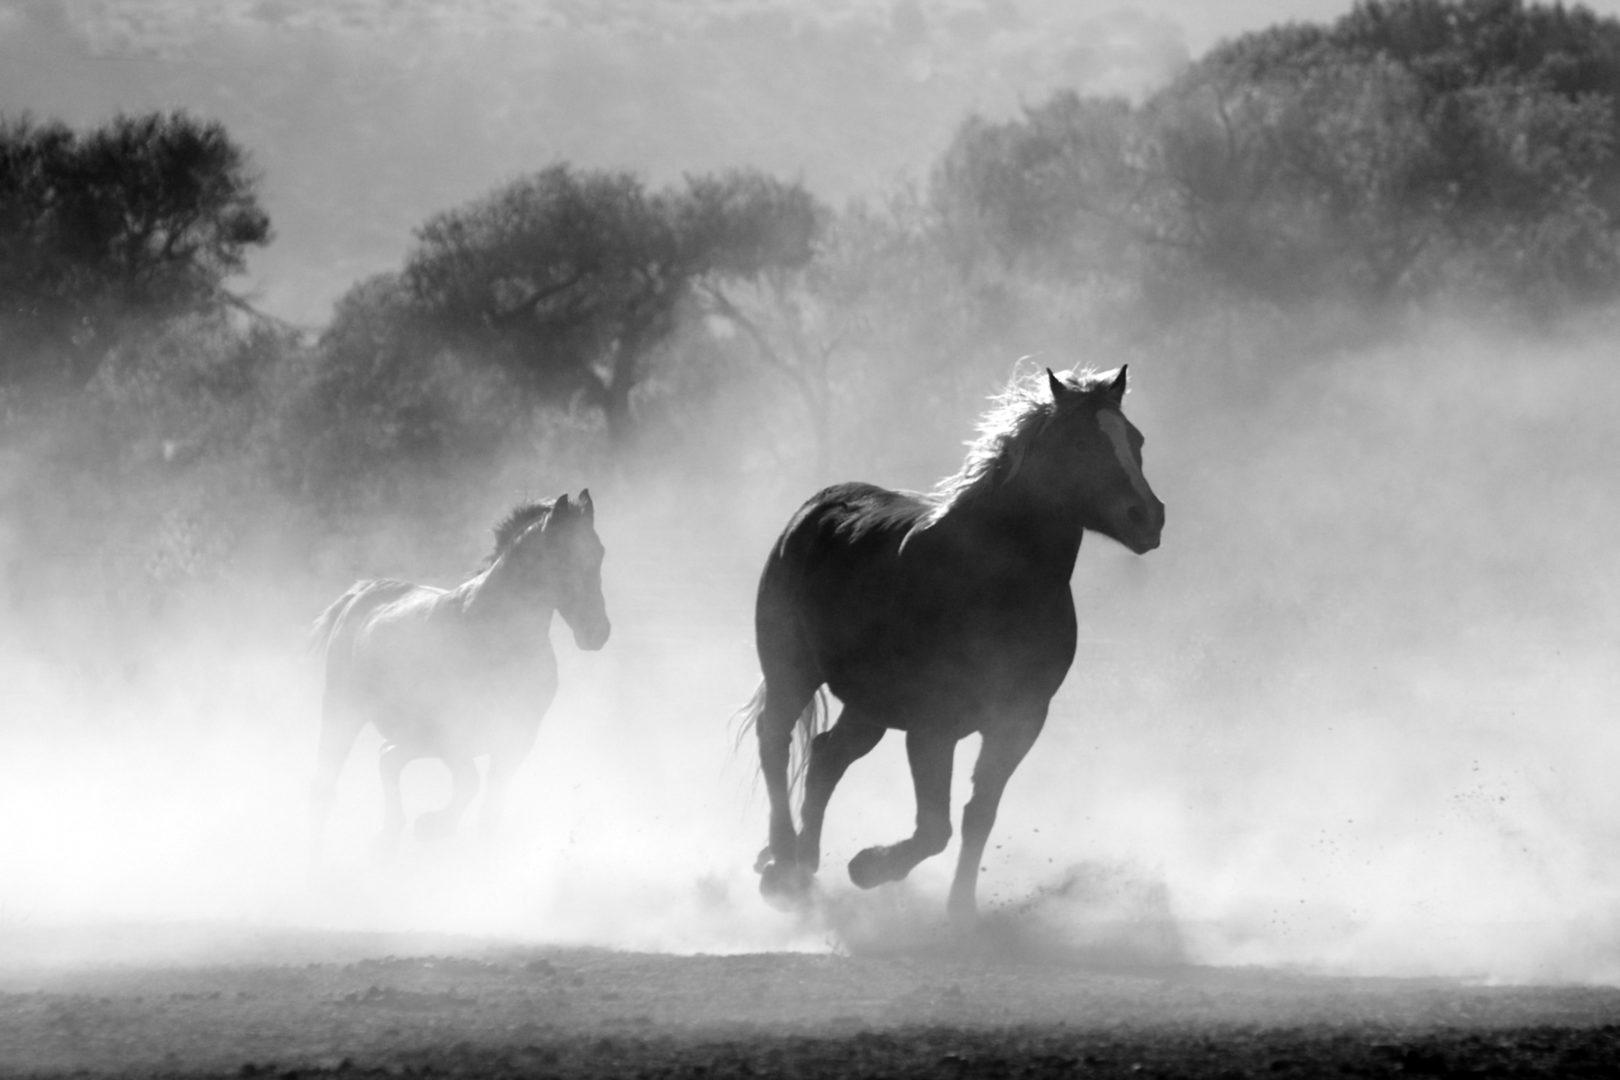 busy horses running wild